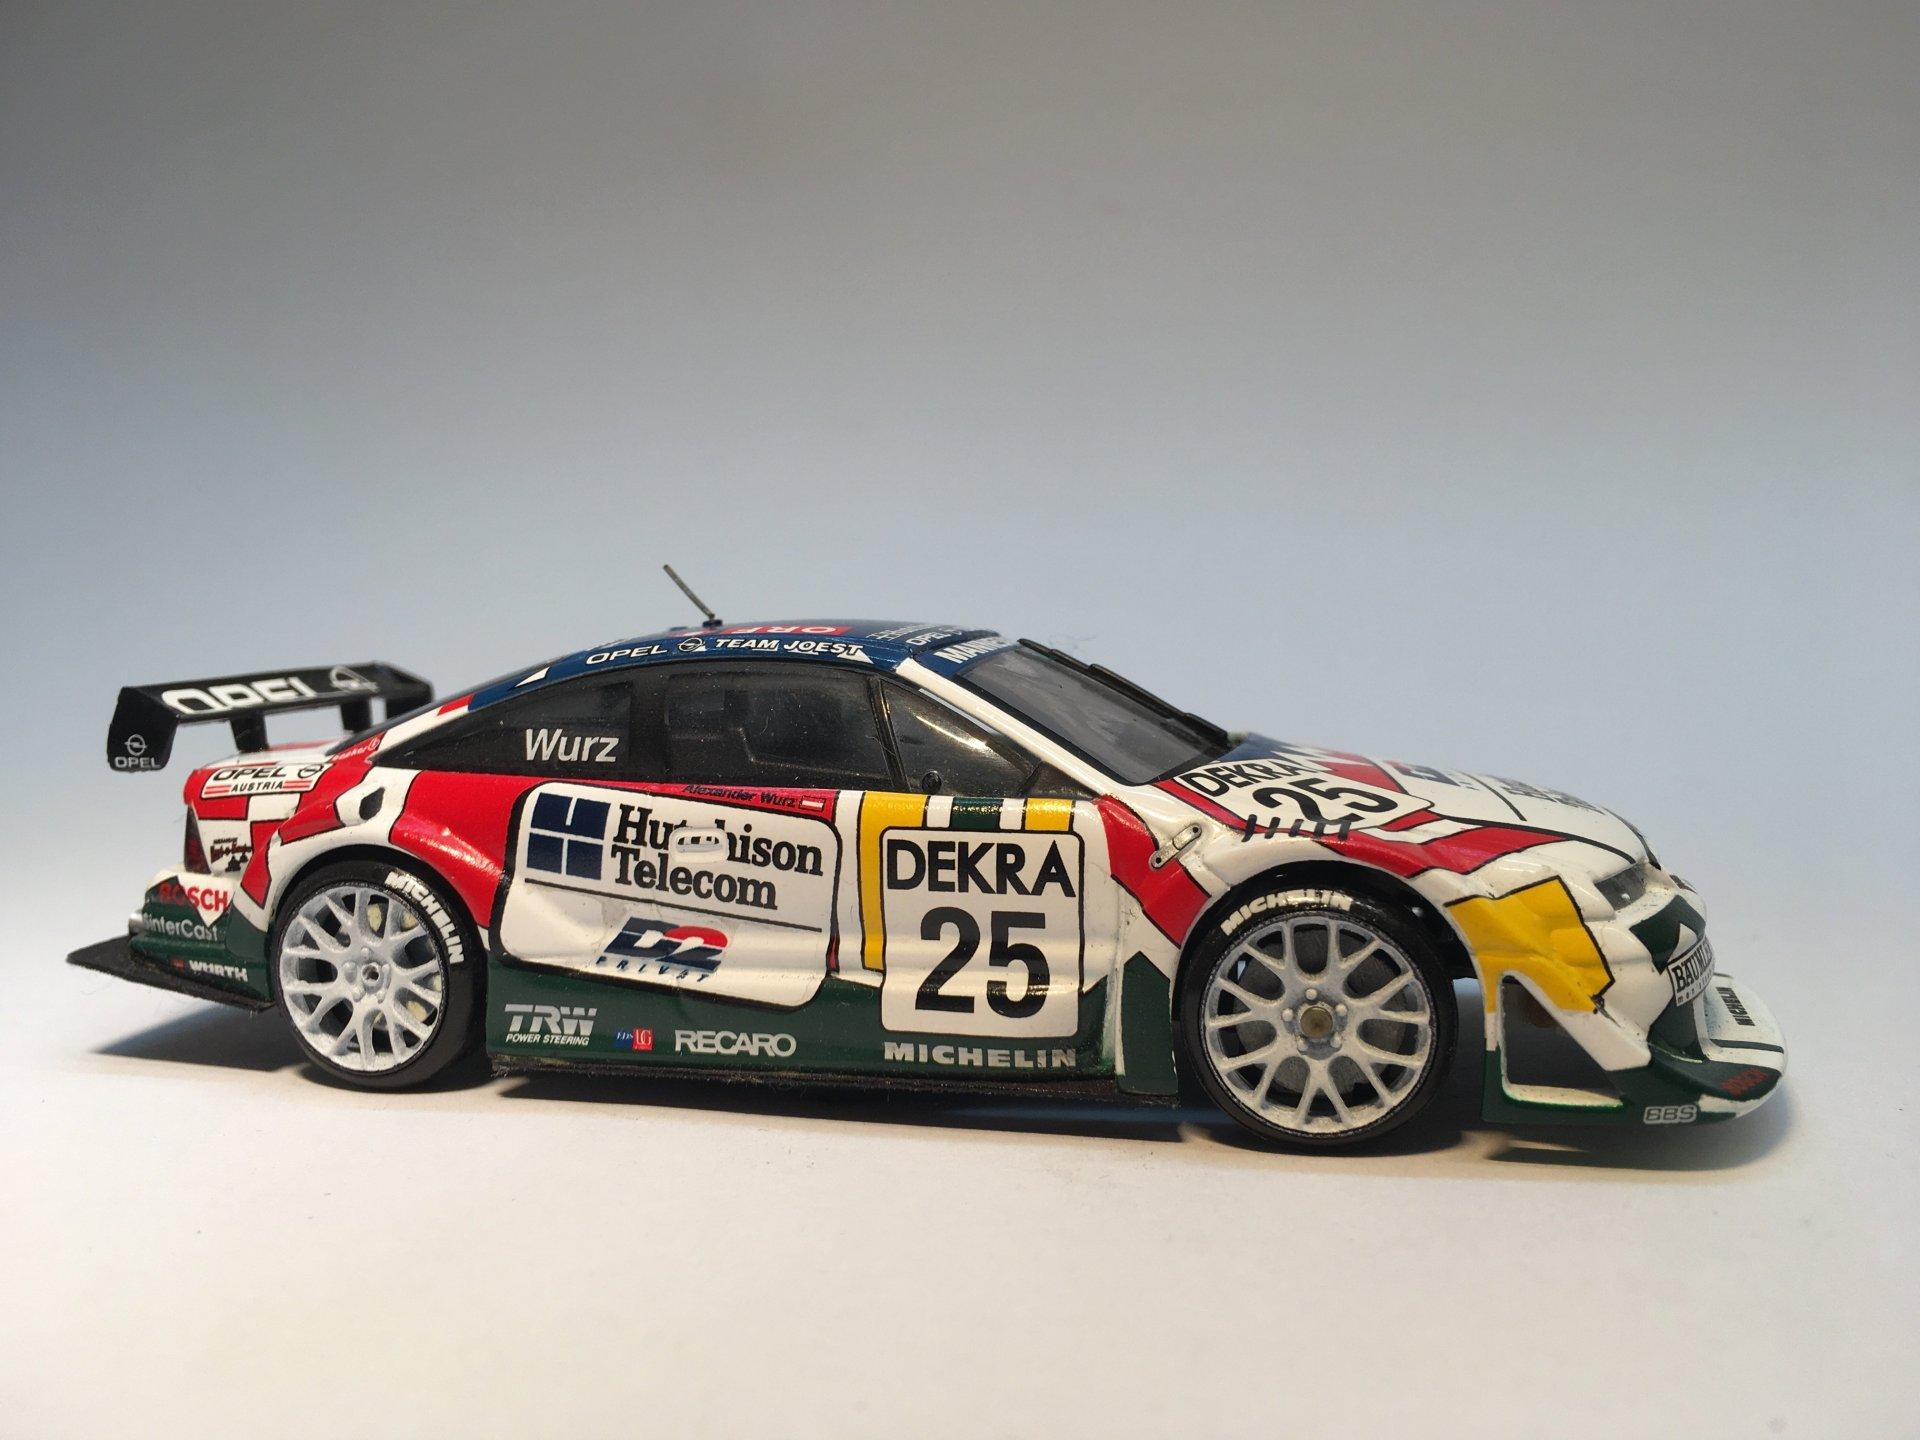 Opel Calibra V6 ITC 1996